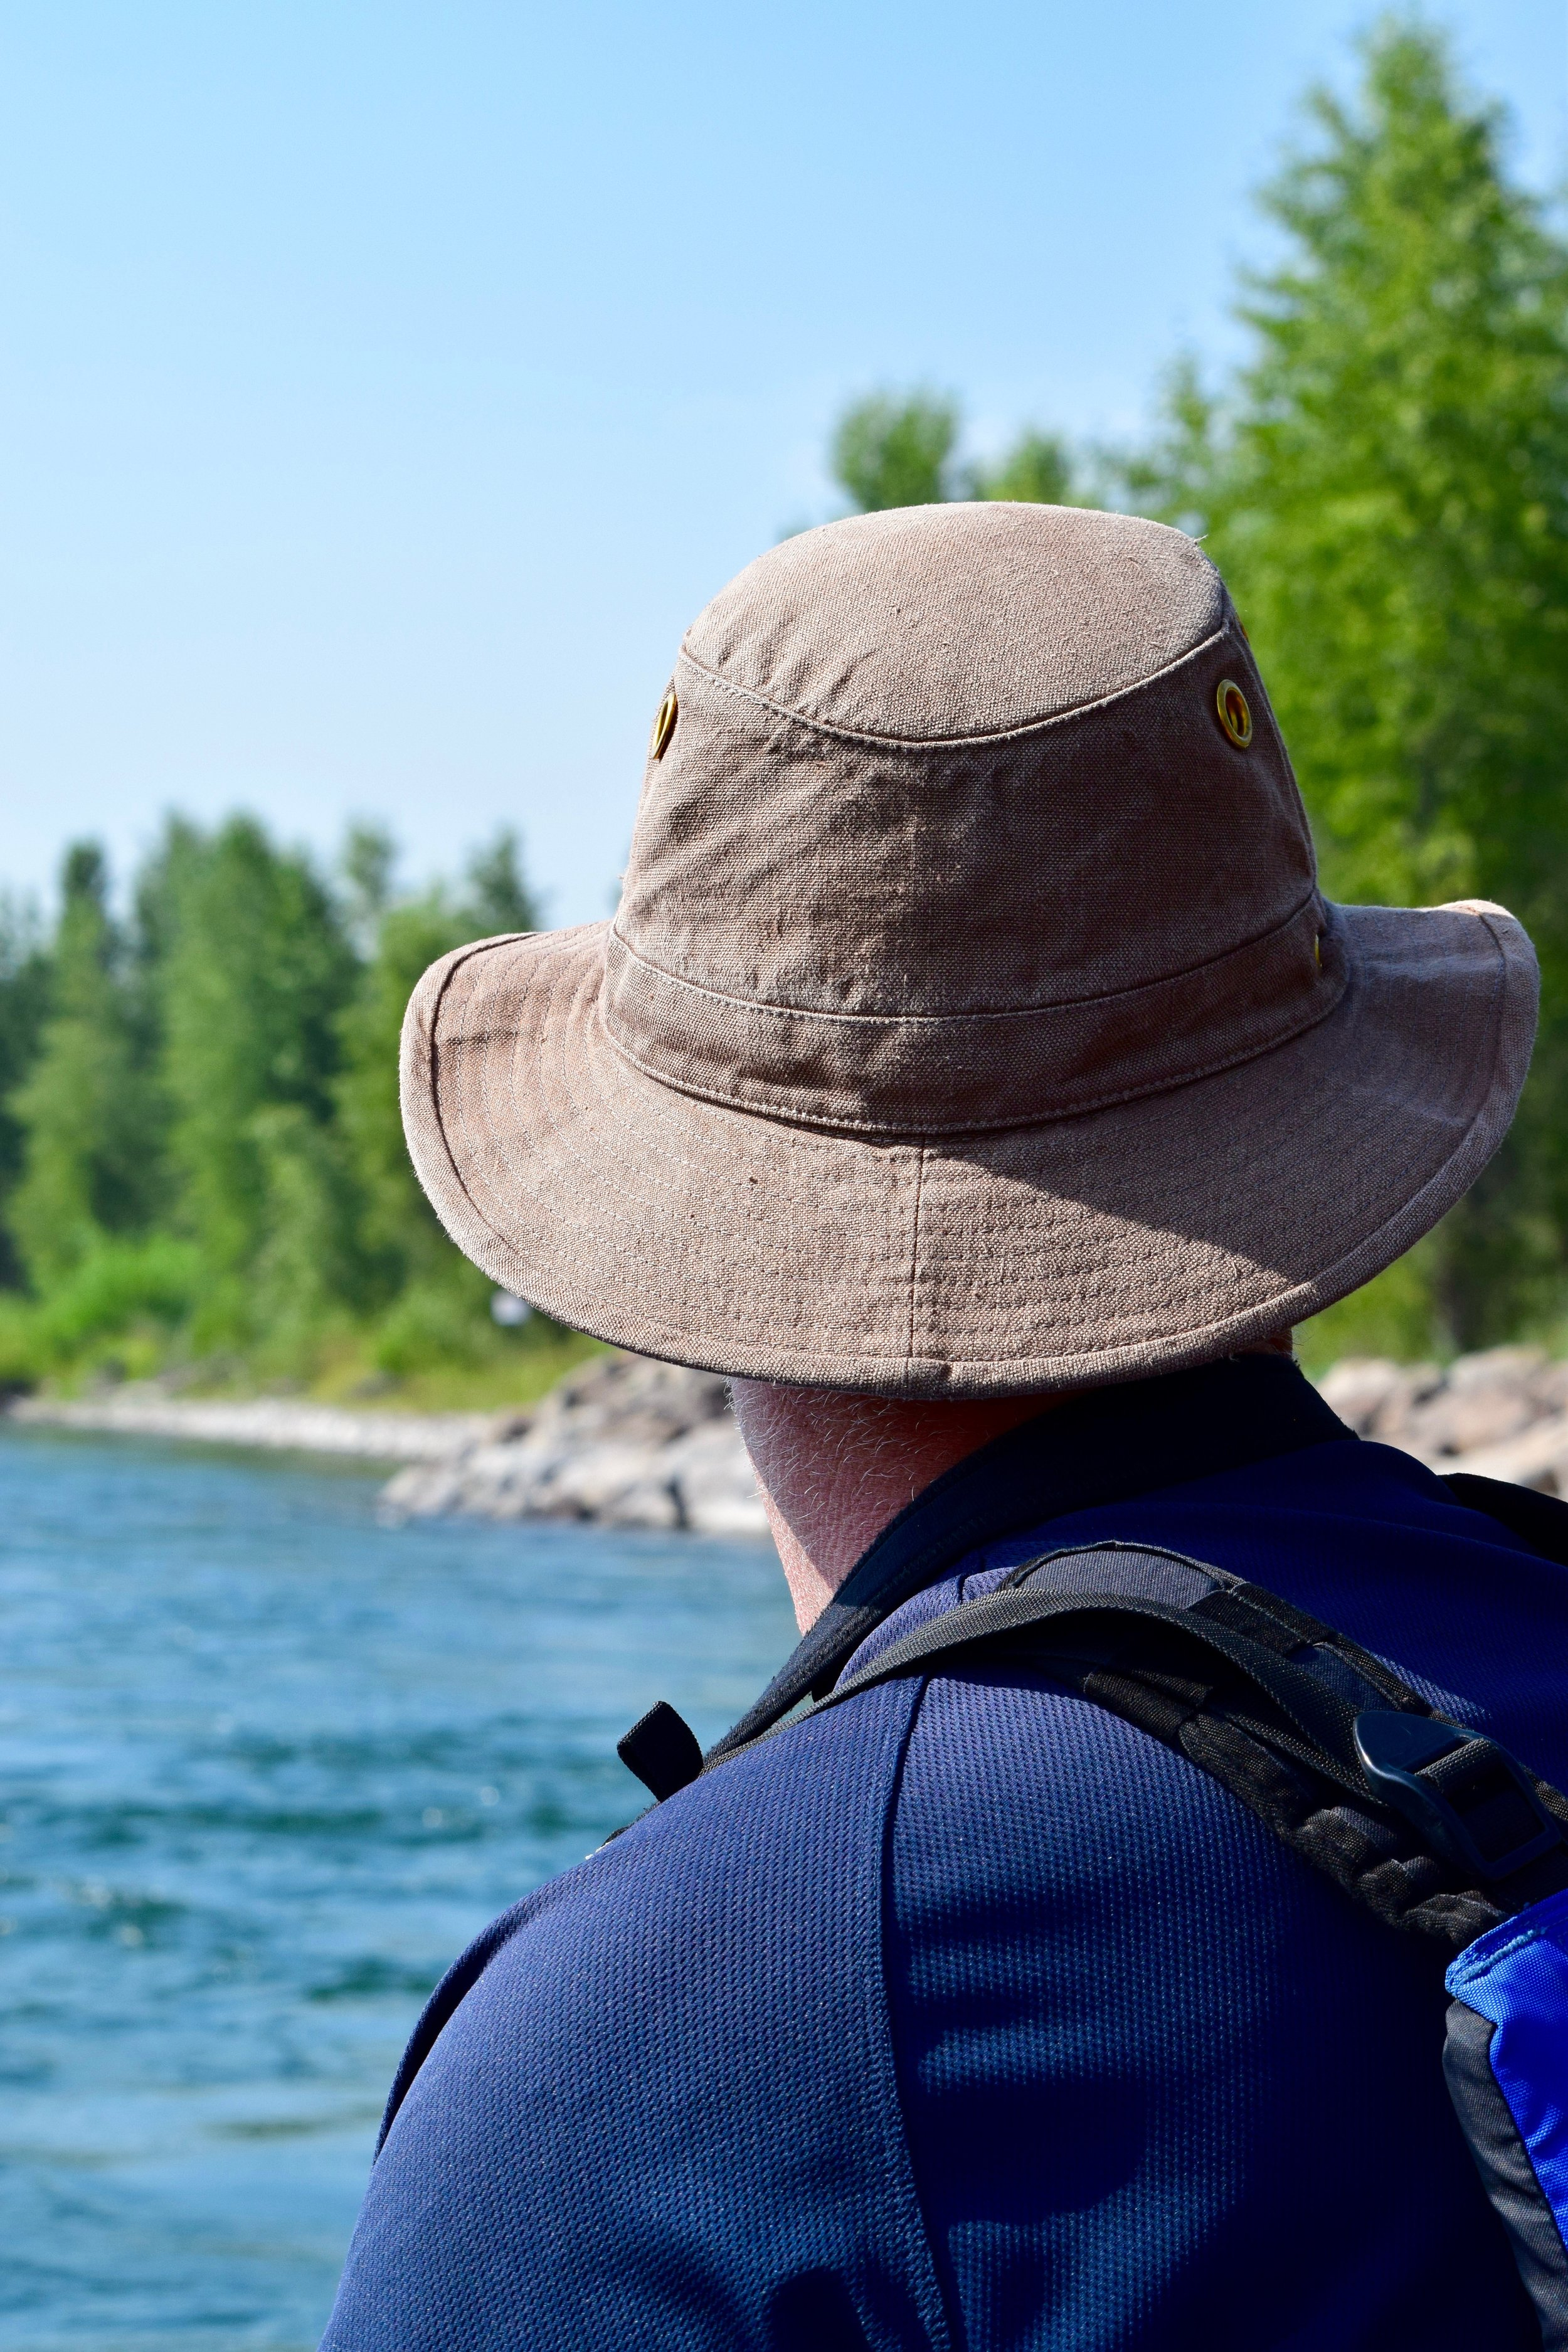 Dad in his adventure hat